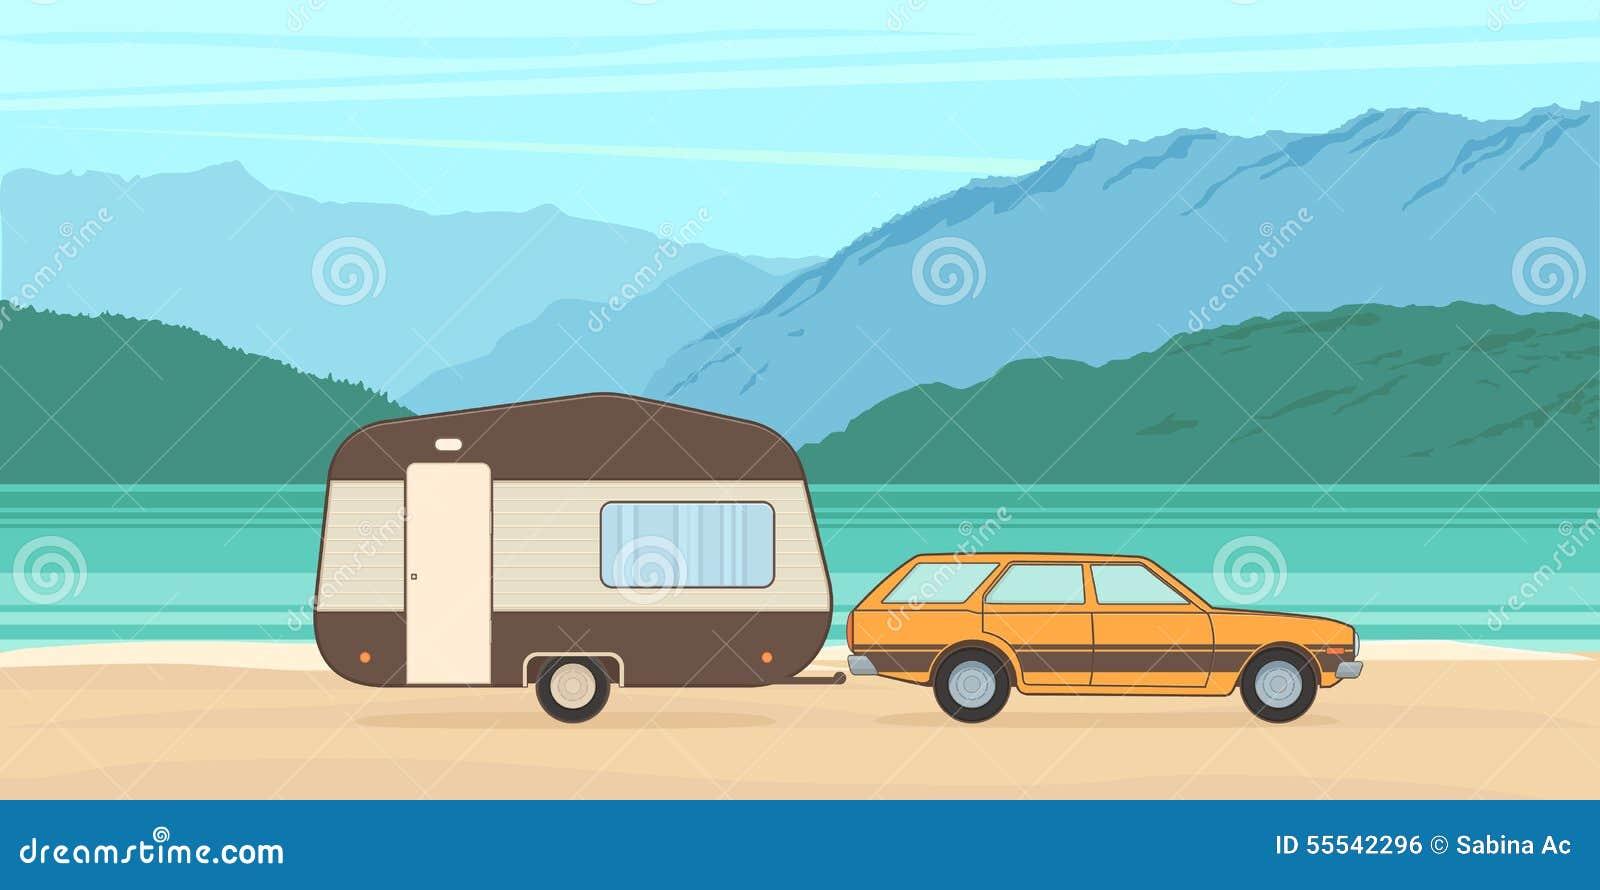 vintage camping caravan and car stock vector image 55542296. Black Bedroom Furniture Sets. Home Design Ideas